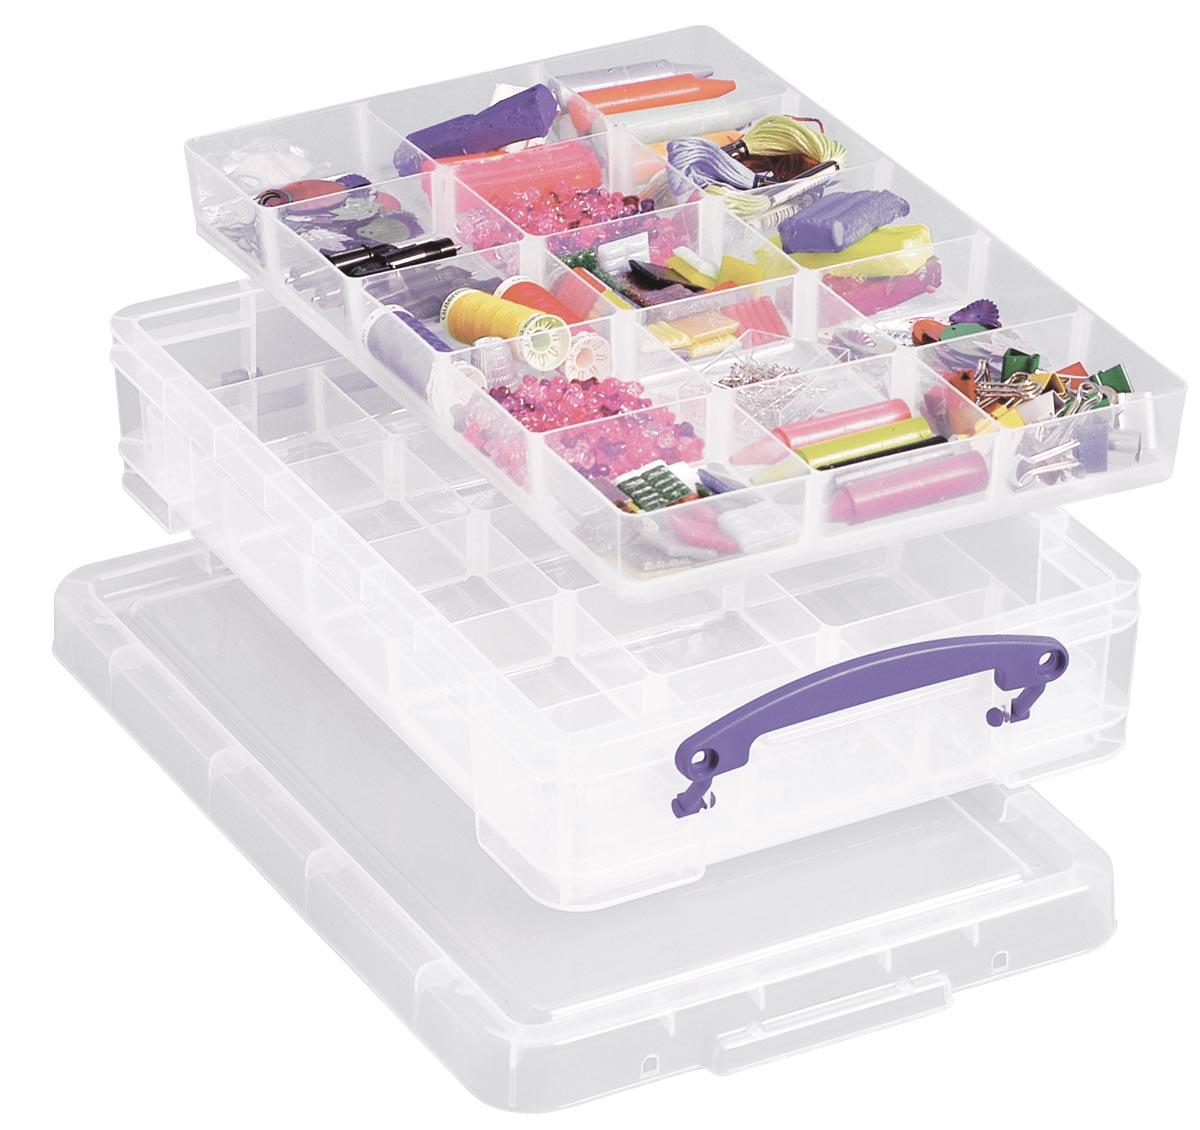 Really Useful Box opbergdoos 4 liter met 2 dividers, transparant